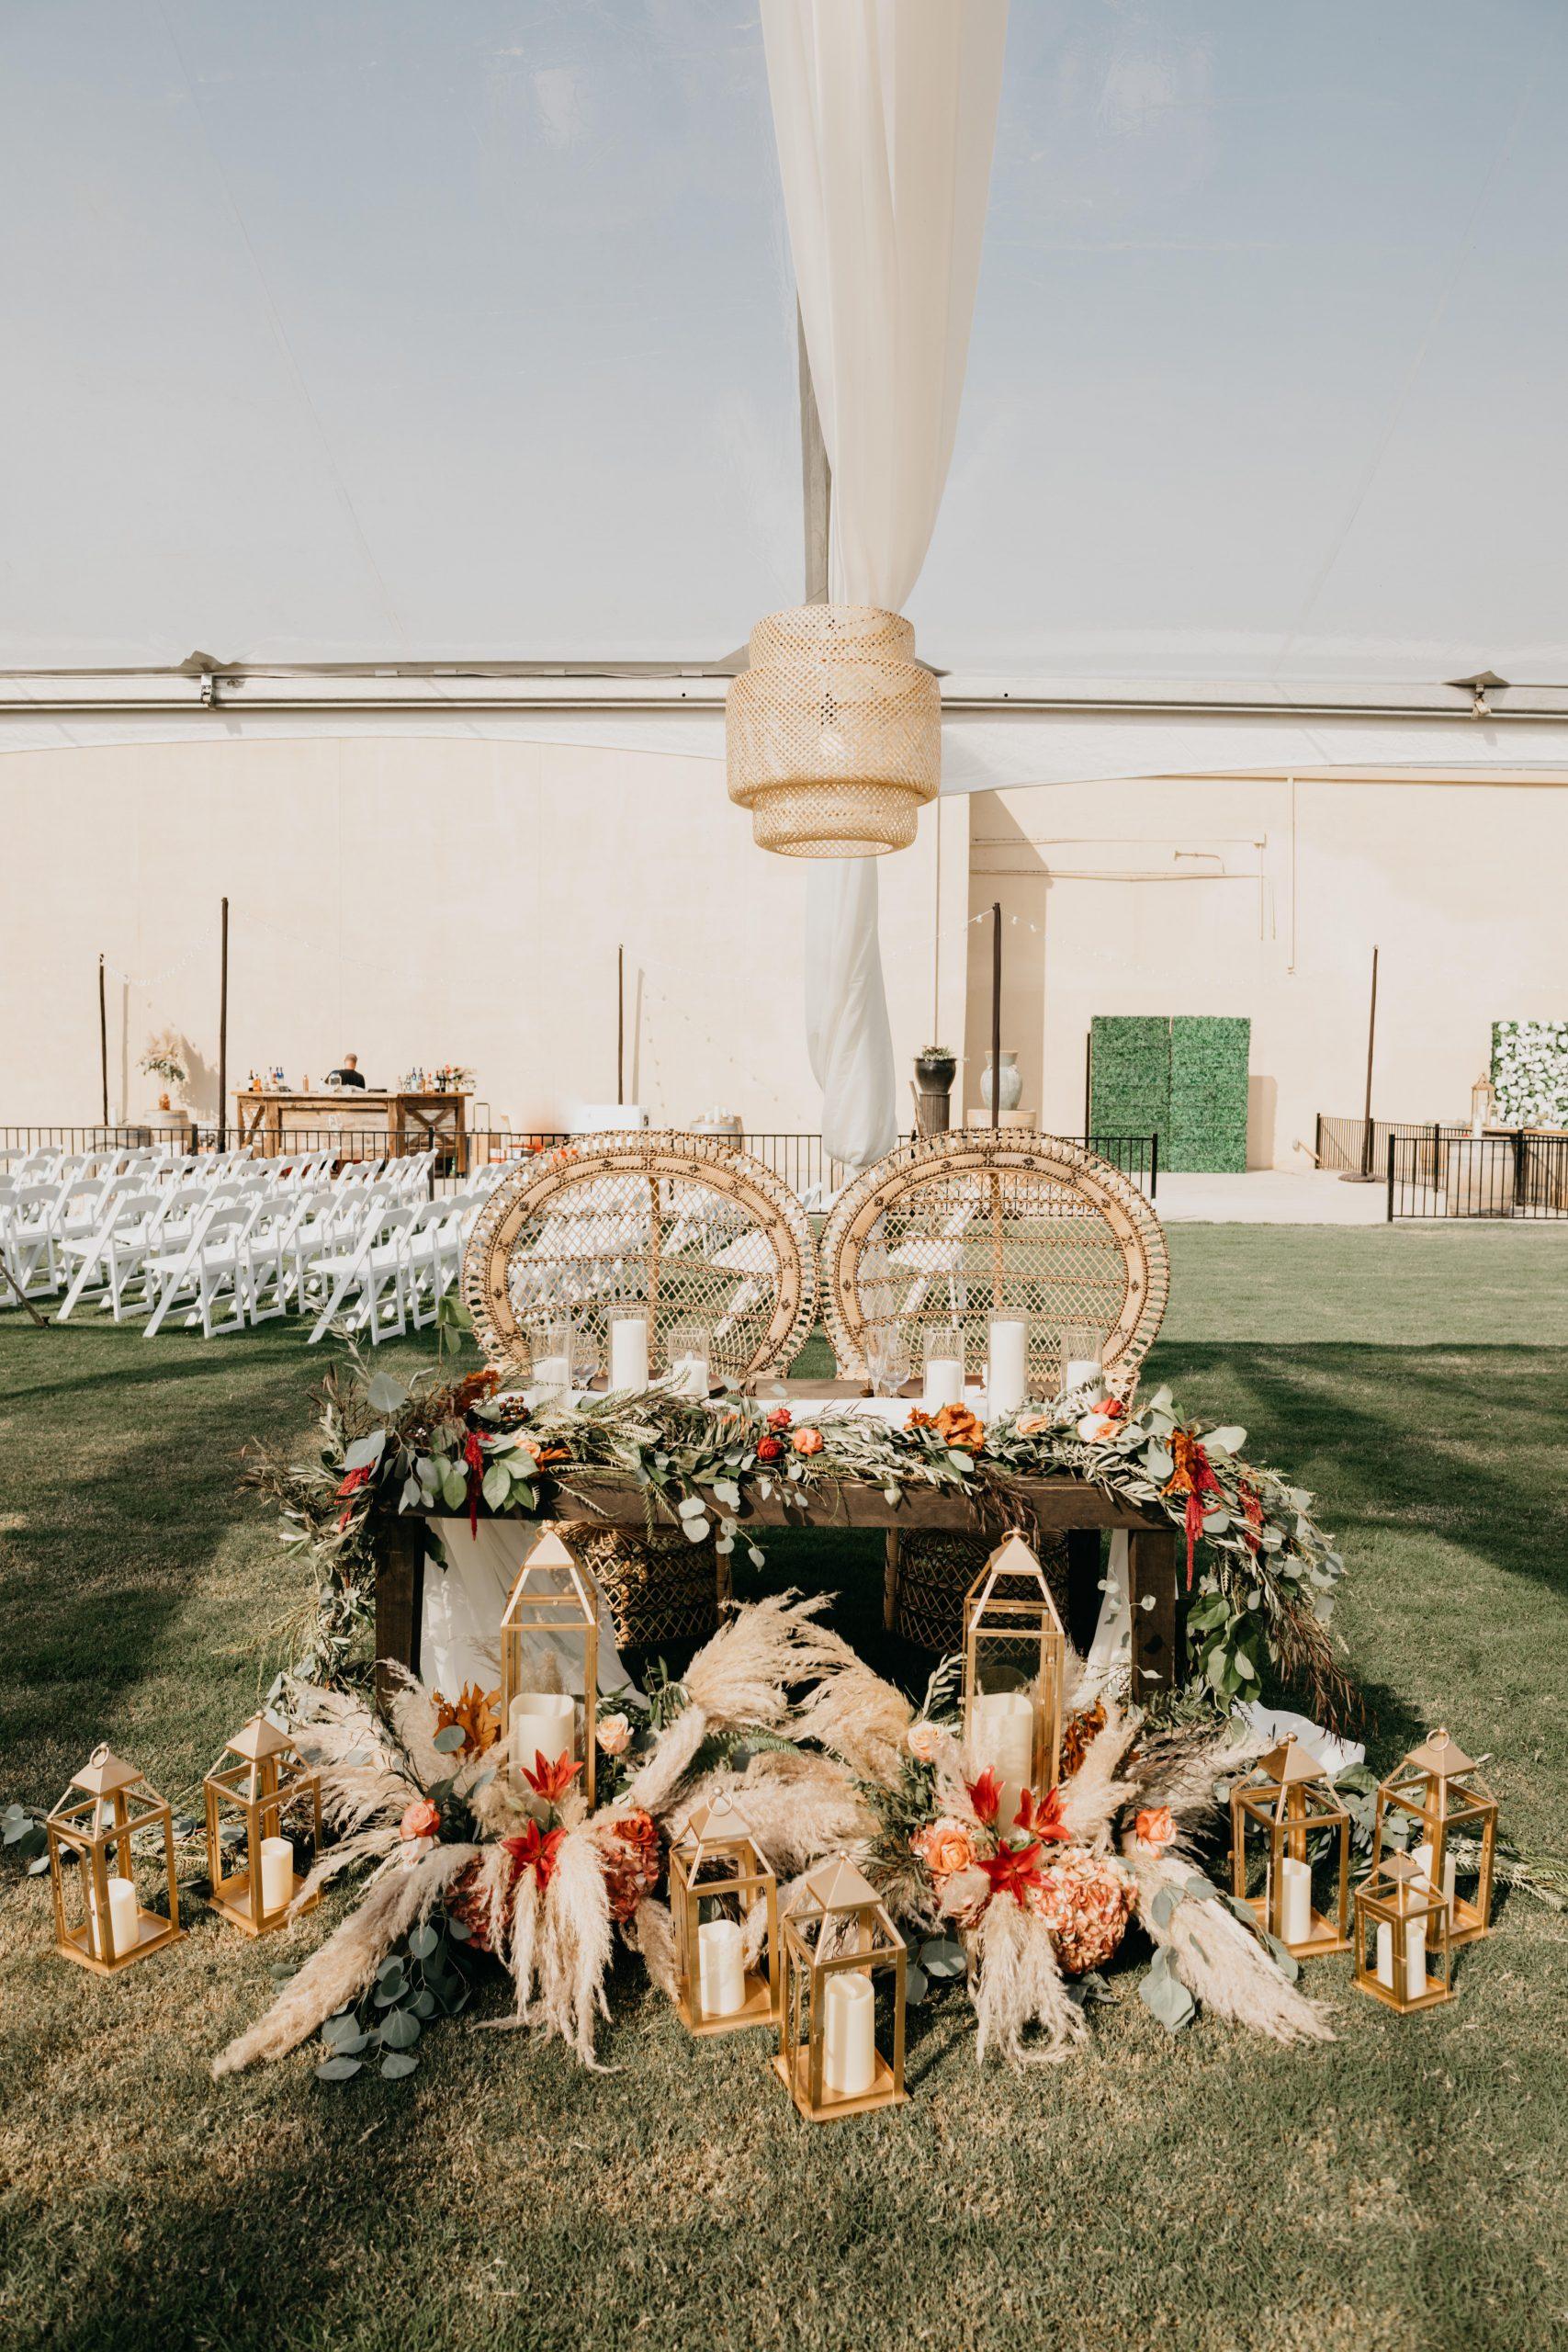 Bridal Sweetheart Table, image by Fatima Elreda Photo